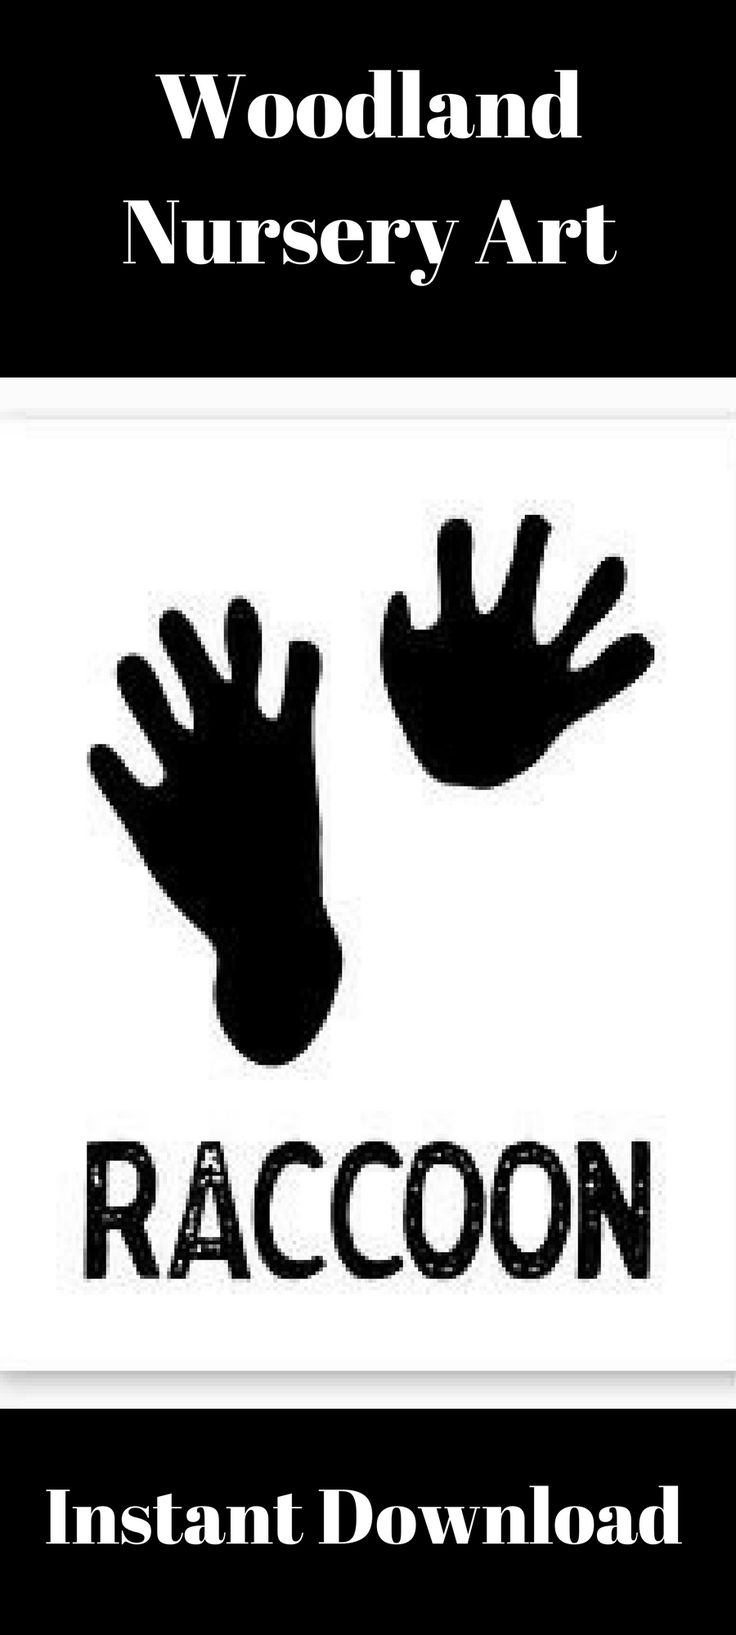 WOODLAND NURSERY, Raccoon Printable, Raccoon Paw Prints, Rustic Nursery, Instant Download, Baby Shower Gift, Rustic Decor, Nature Decor #afflink